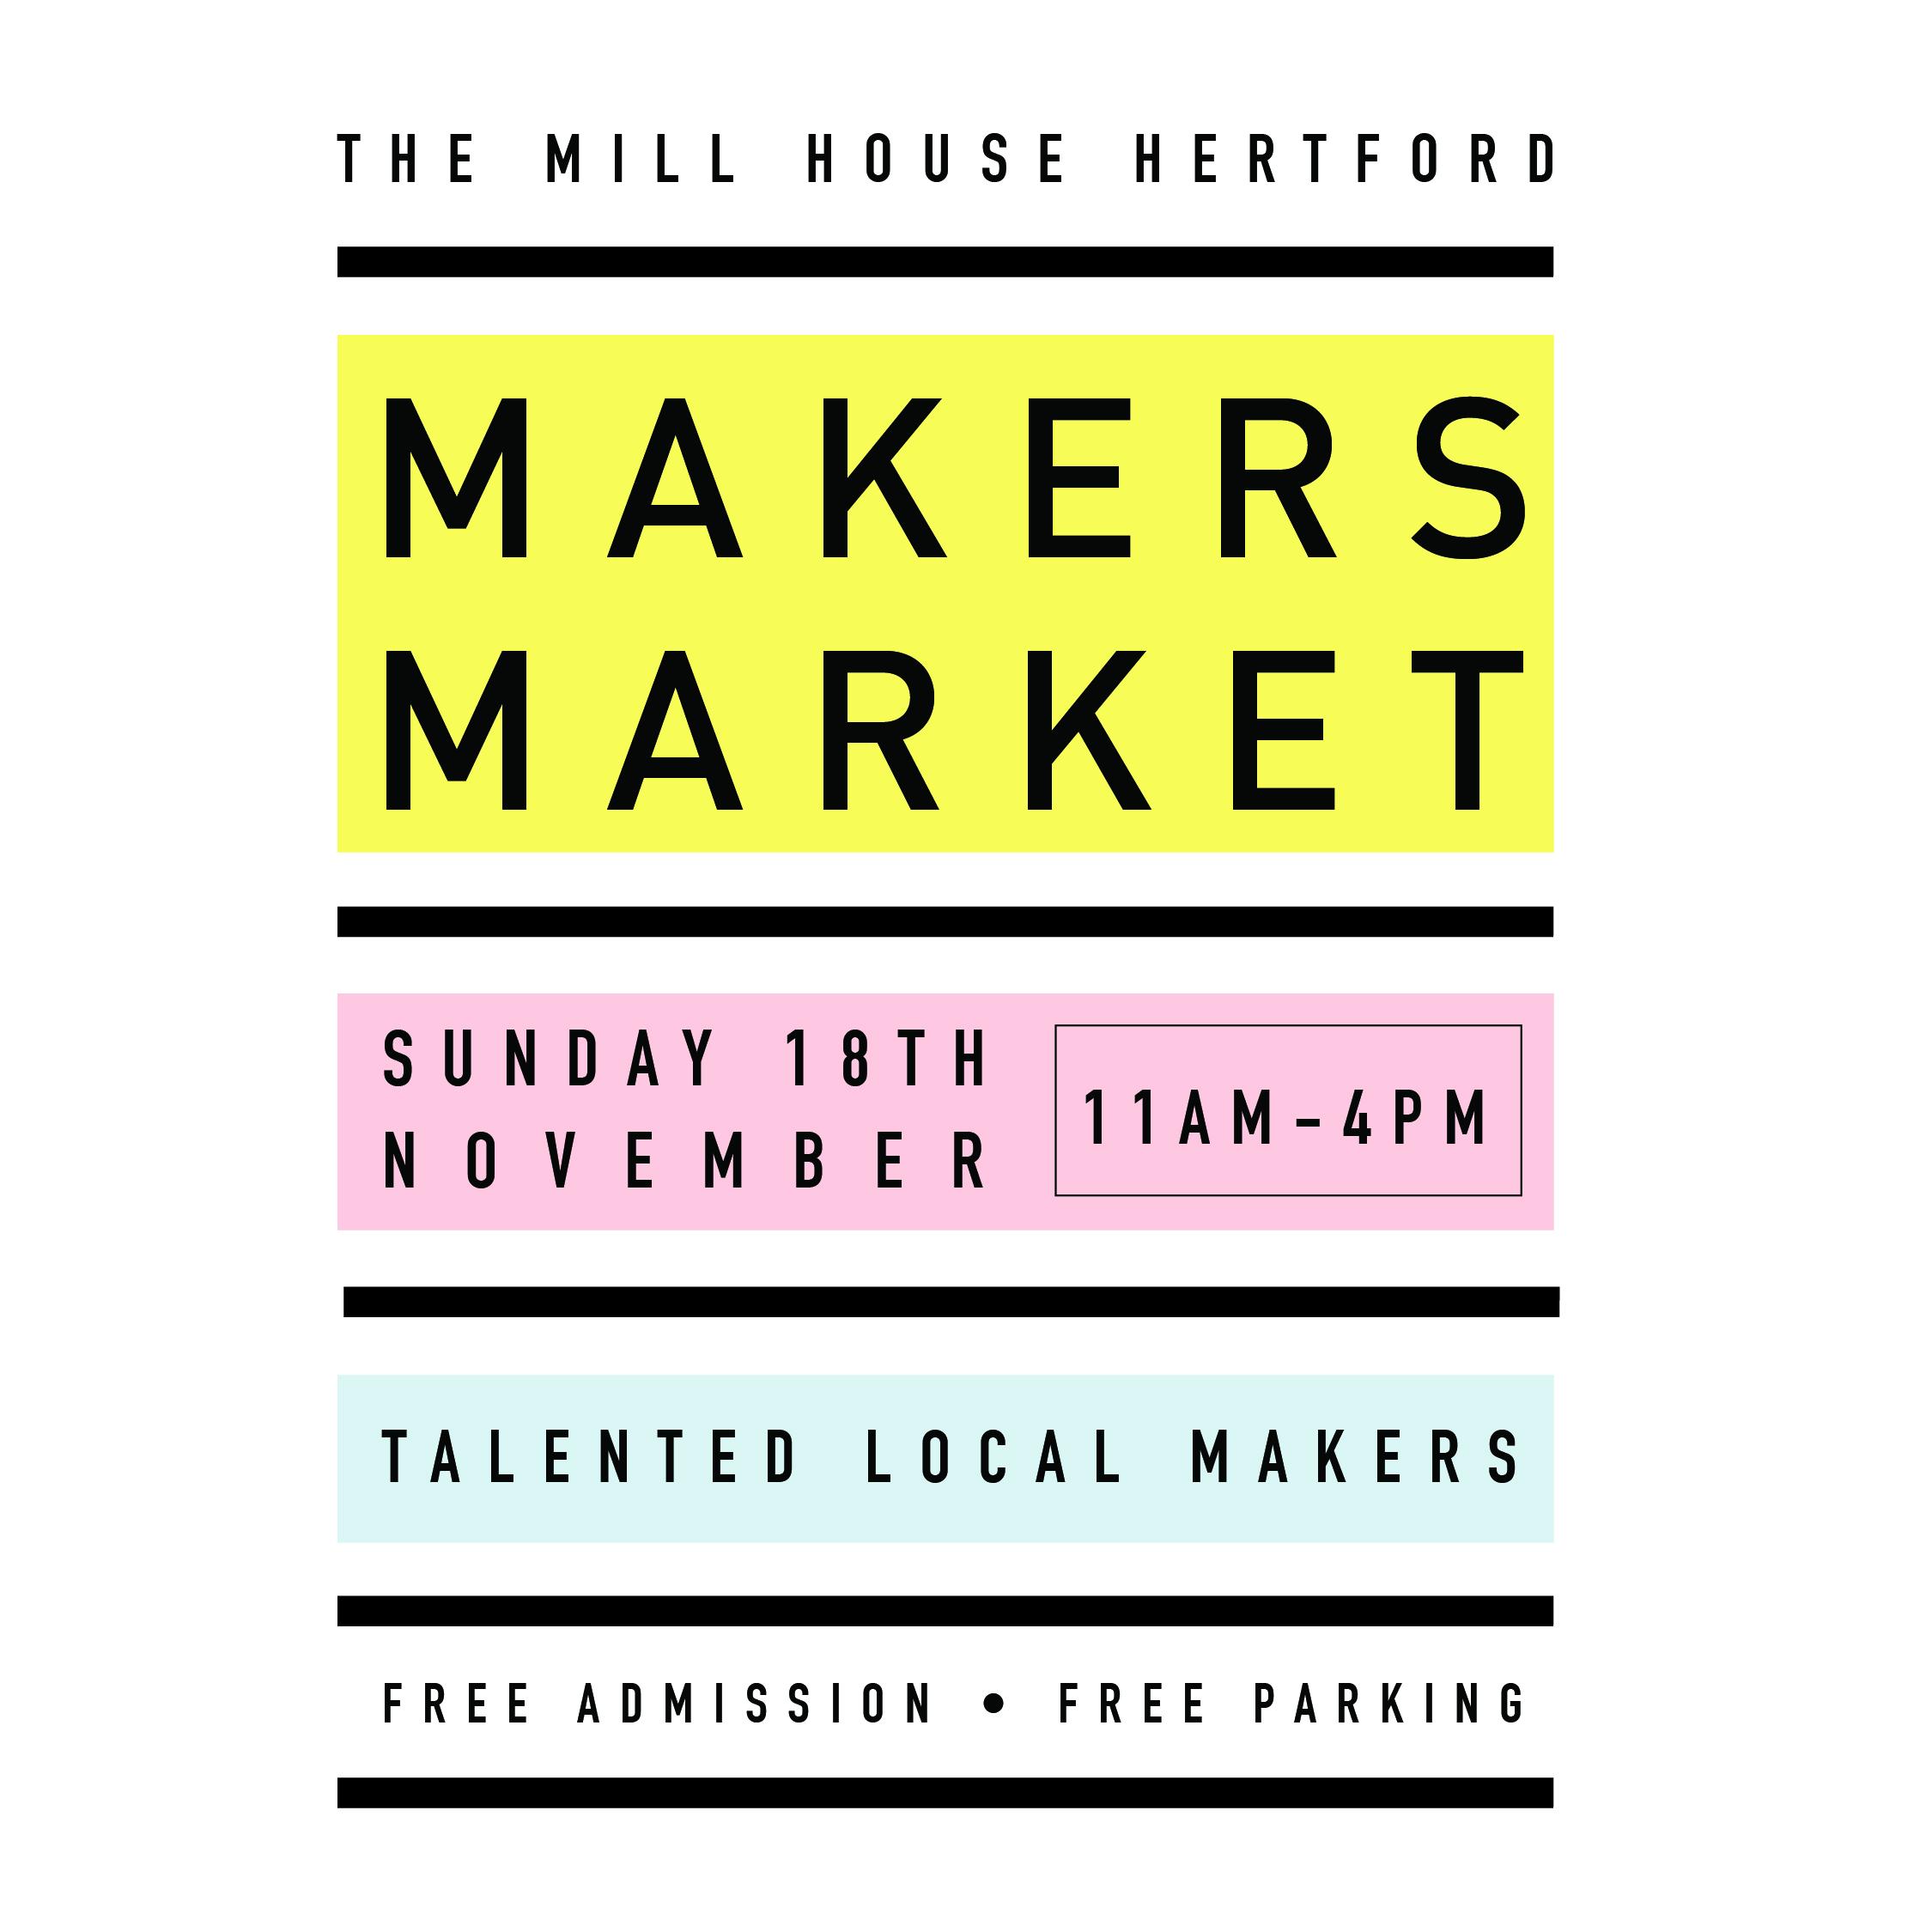 Makers Market @themillhousehertford on  Sunday November 18th